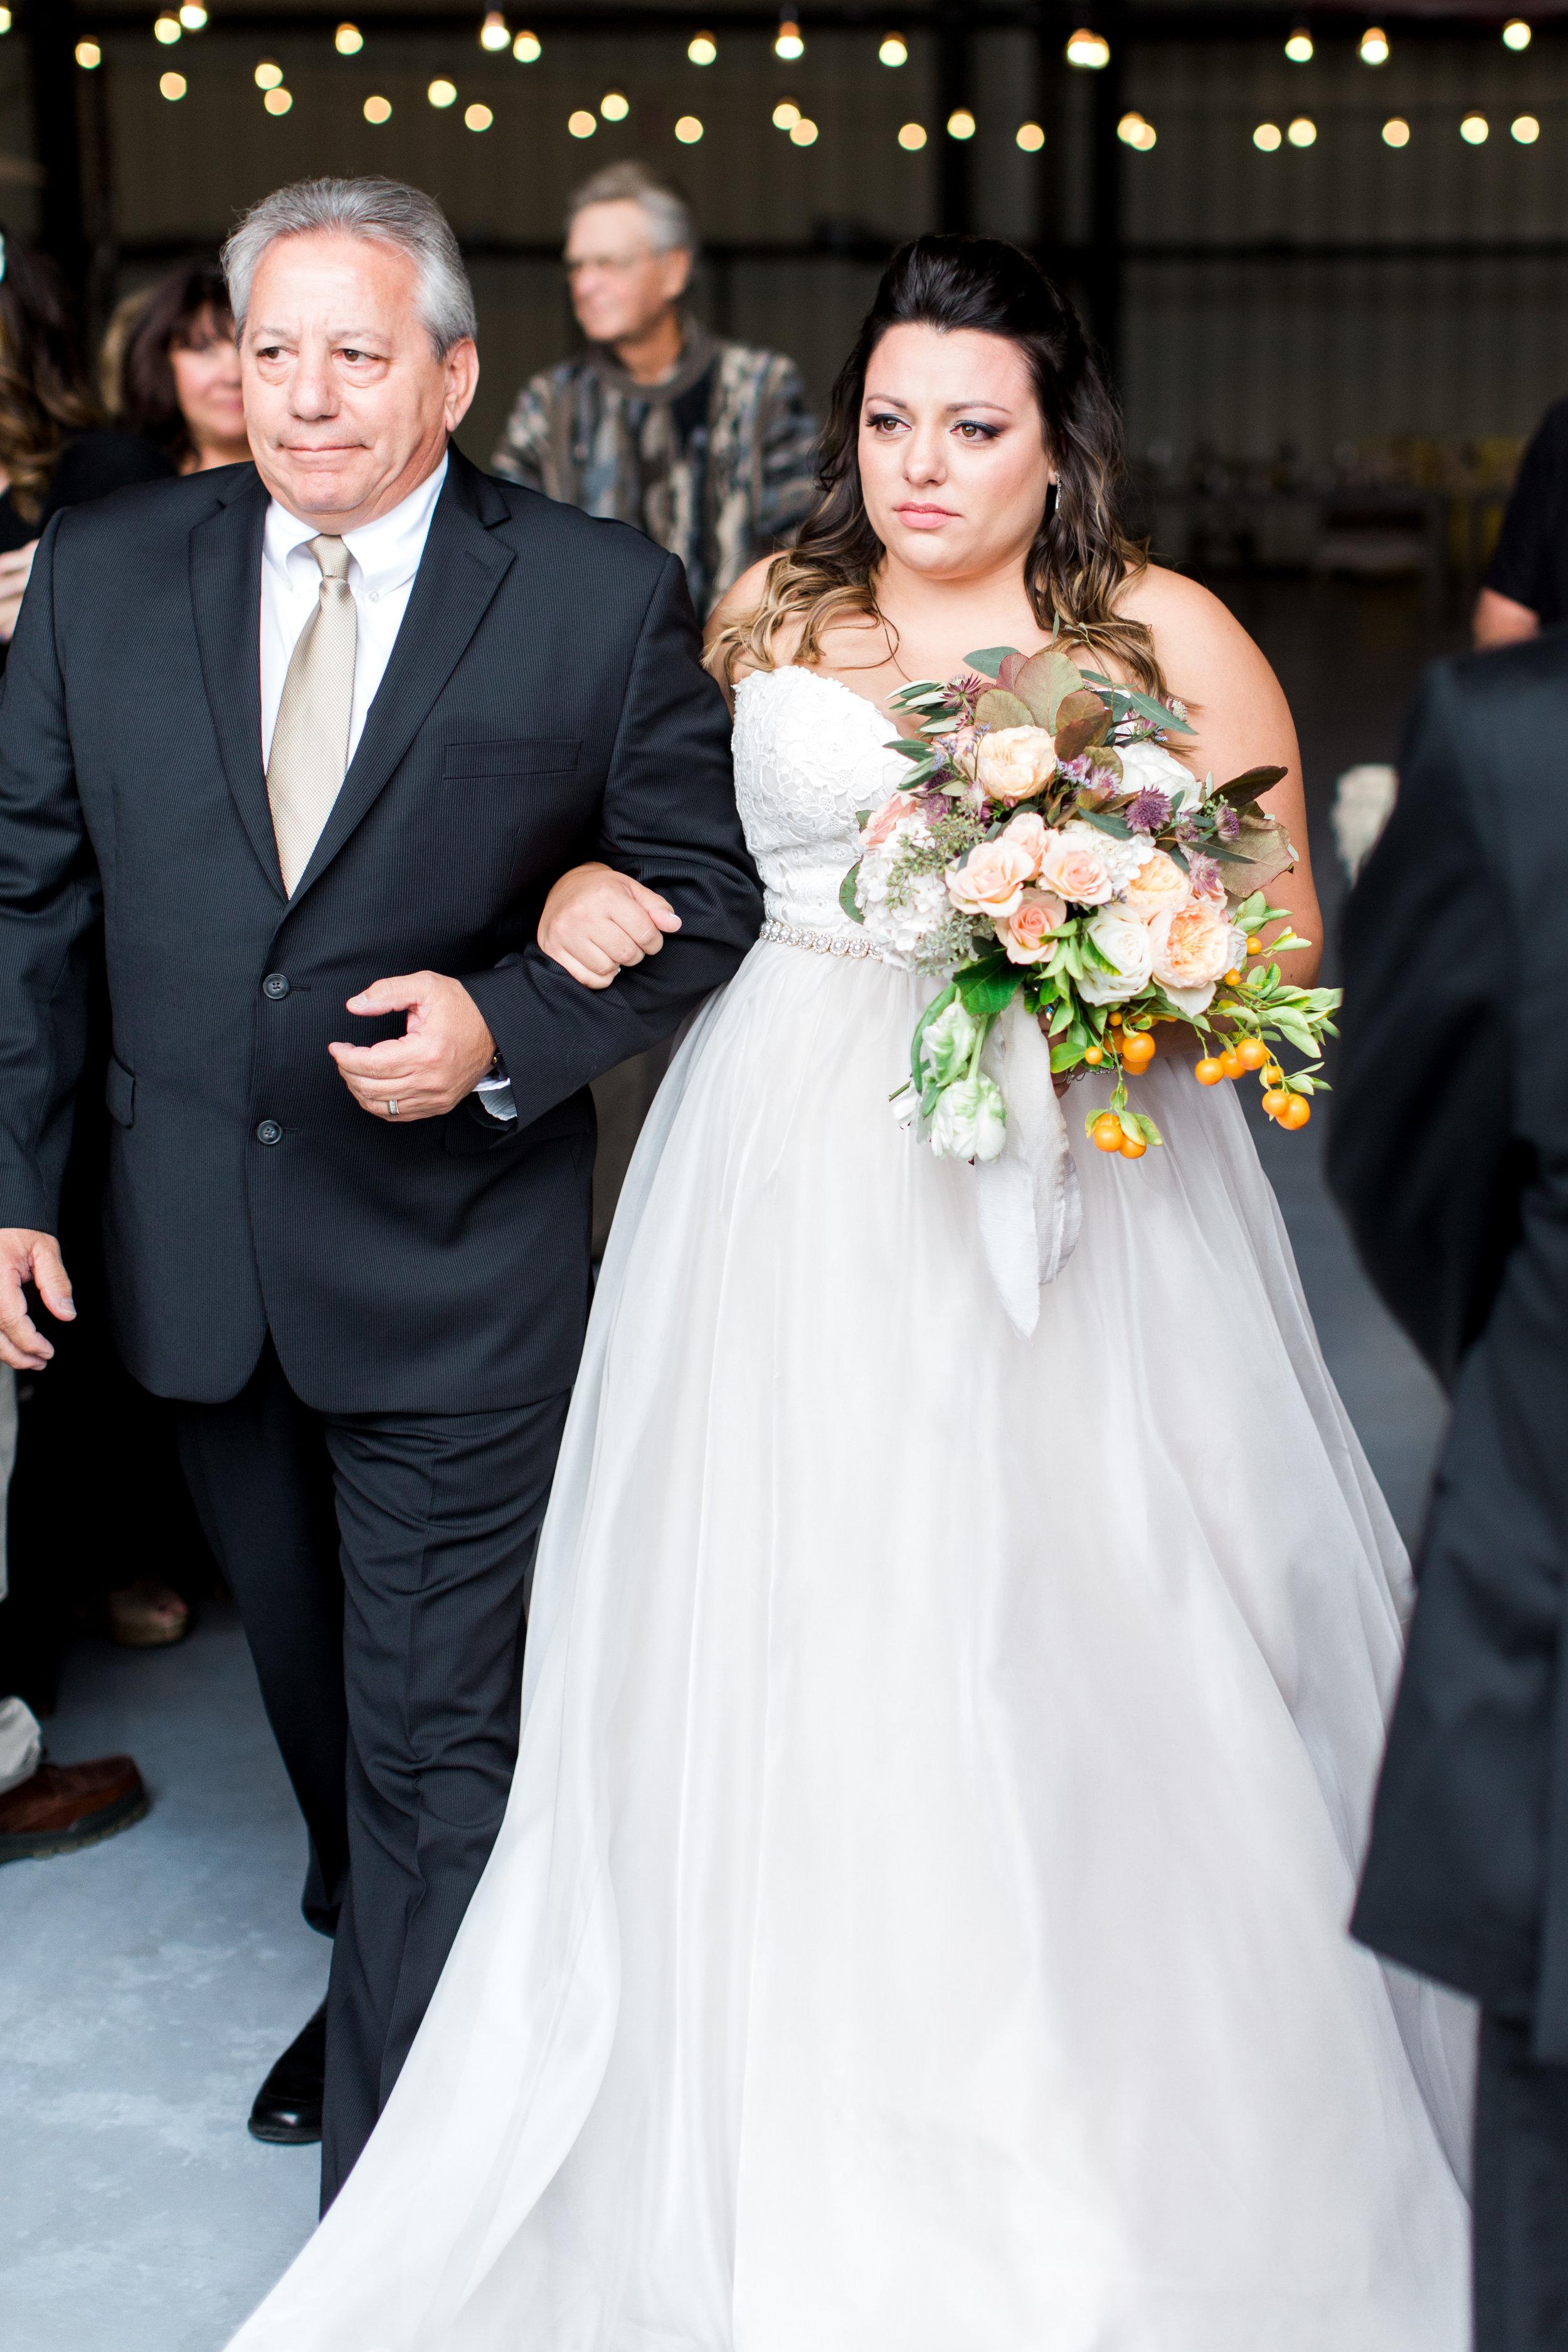 airport-hanger-wedding-at-attitude-aviation-in-livermore-49.jpg